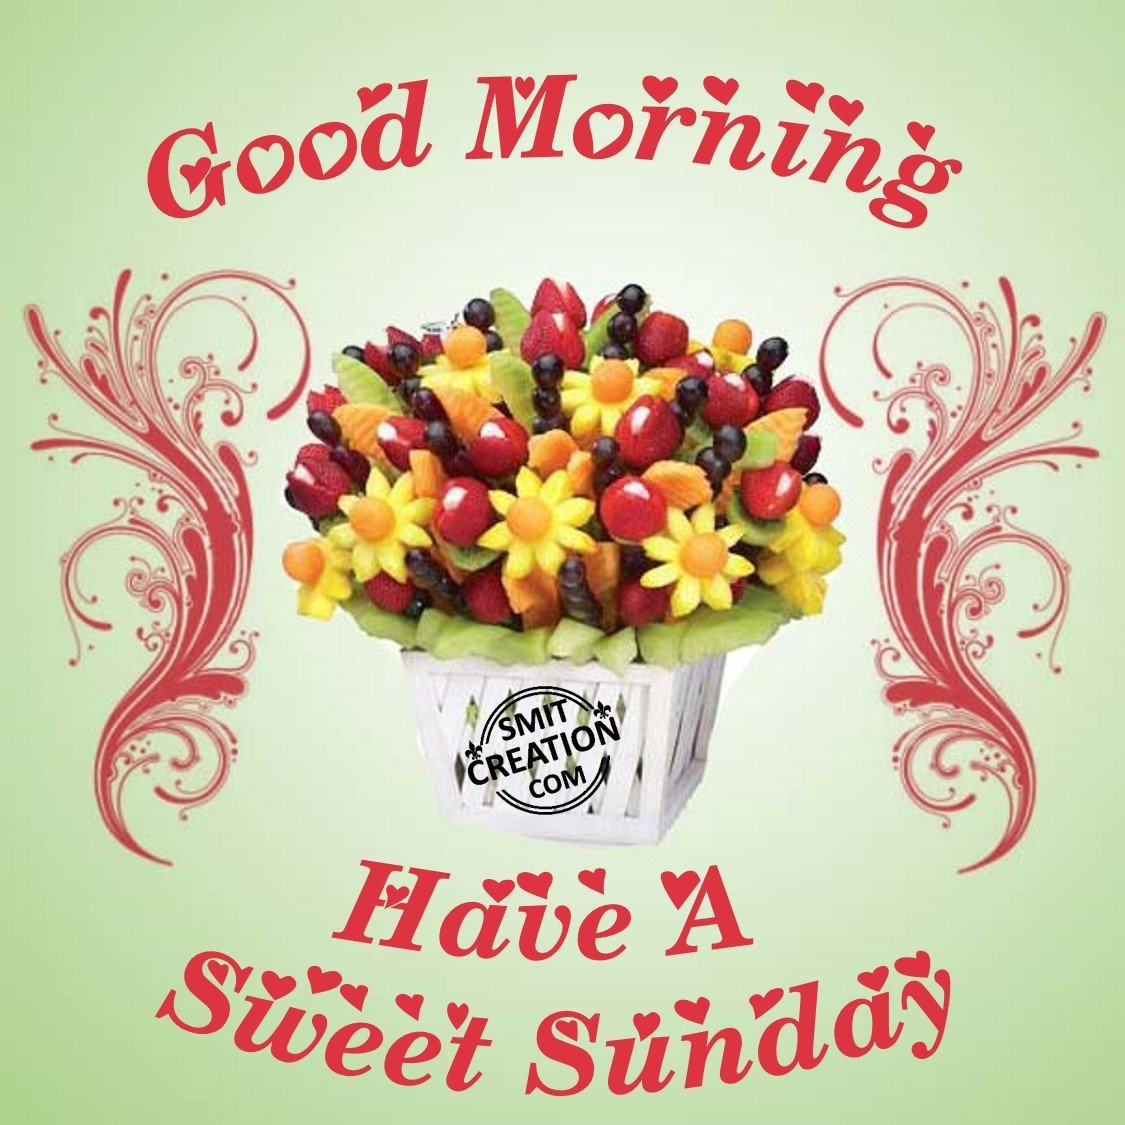 Good Morning And Happy Sunday Text : Good morning have a sweet sunday smitcreation